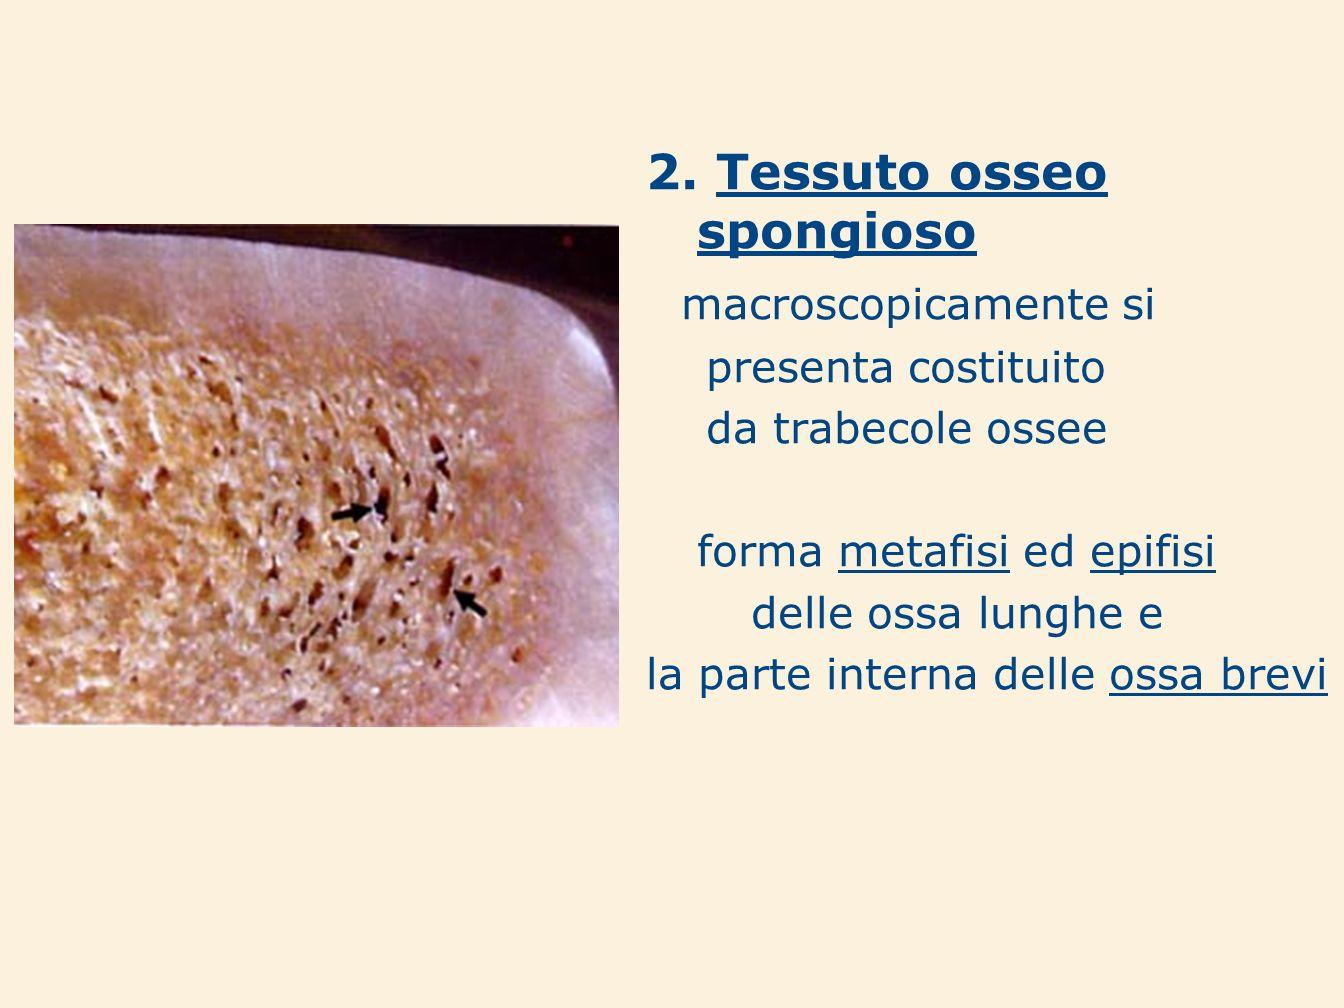 2. Tessuto osseo spongioso macroscopicamente si